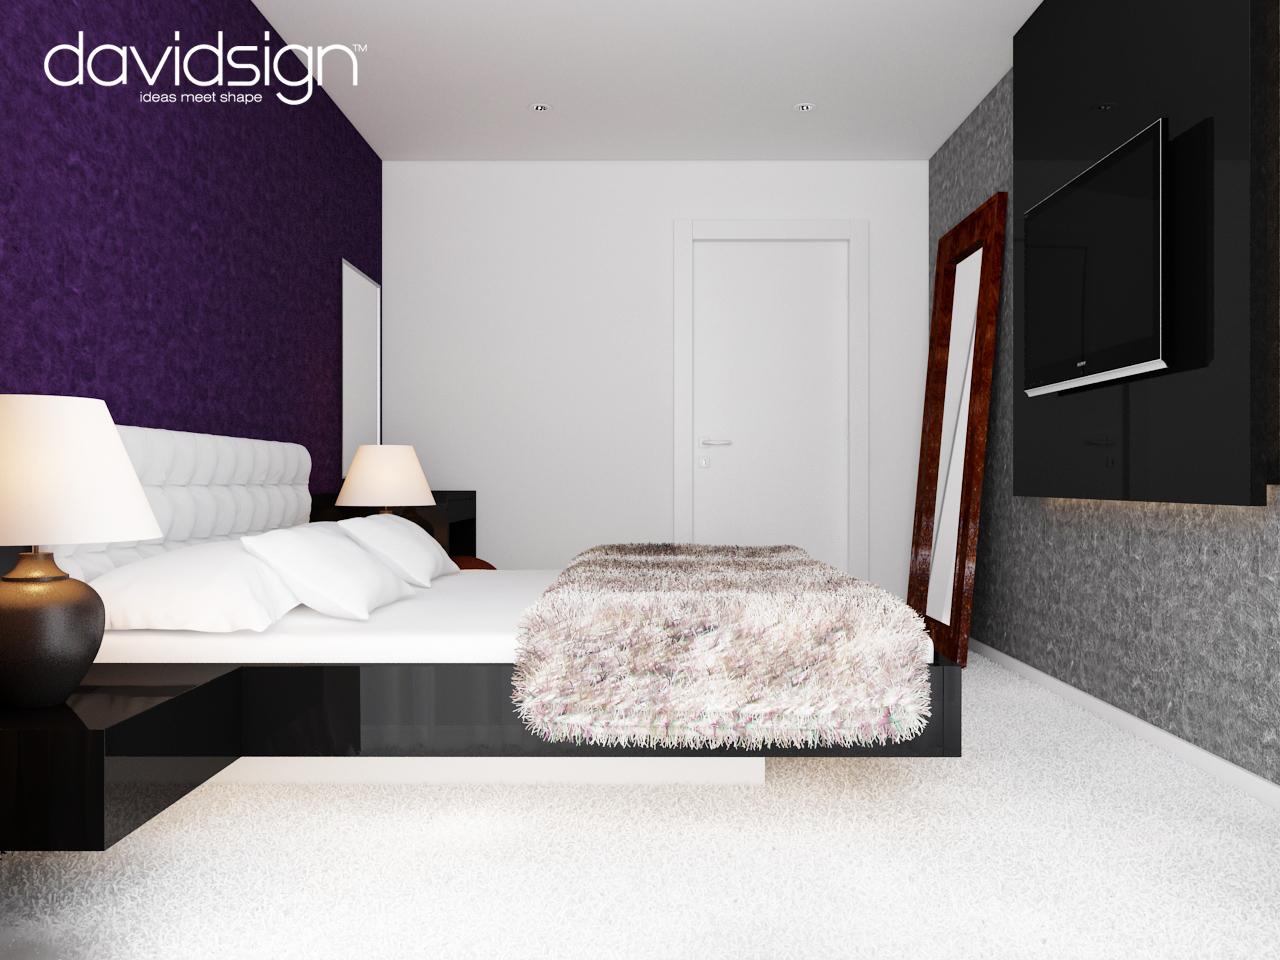 Dormitor modern 2014 Design interior